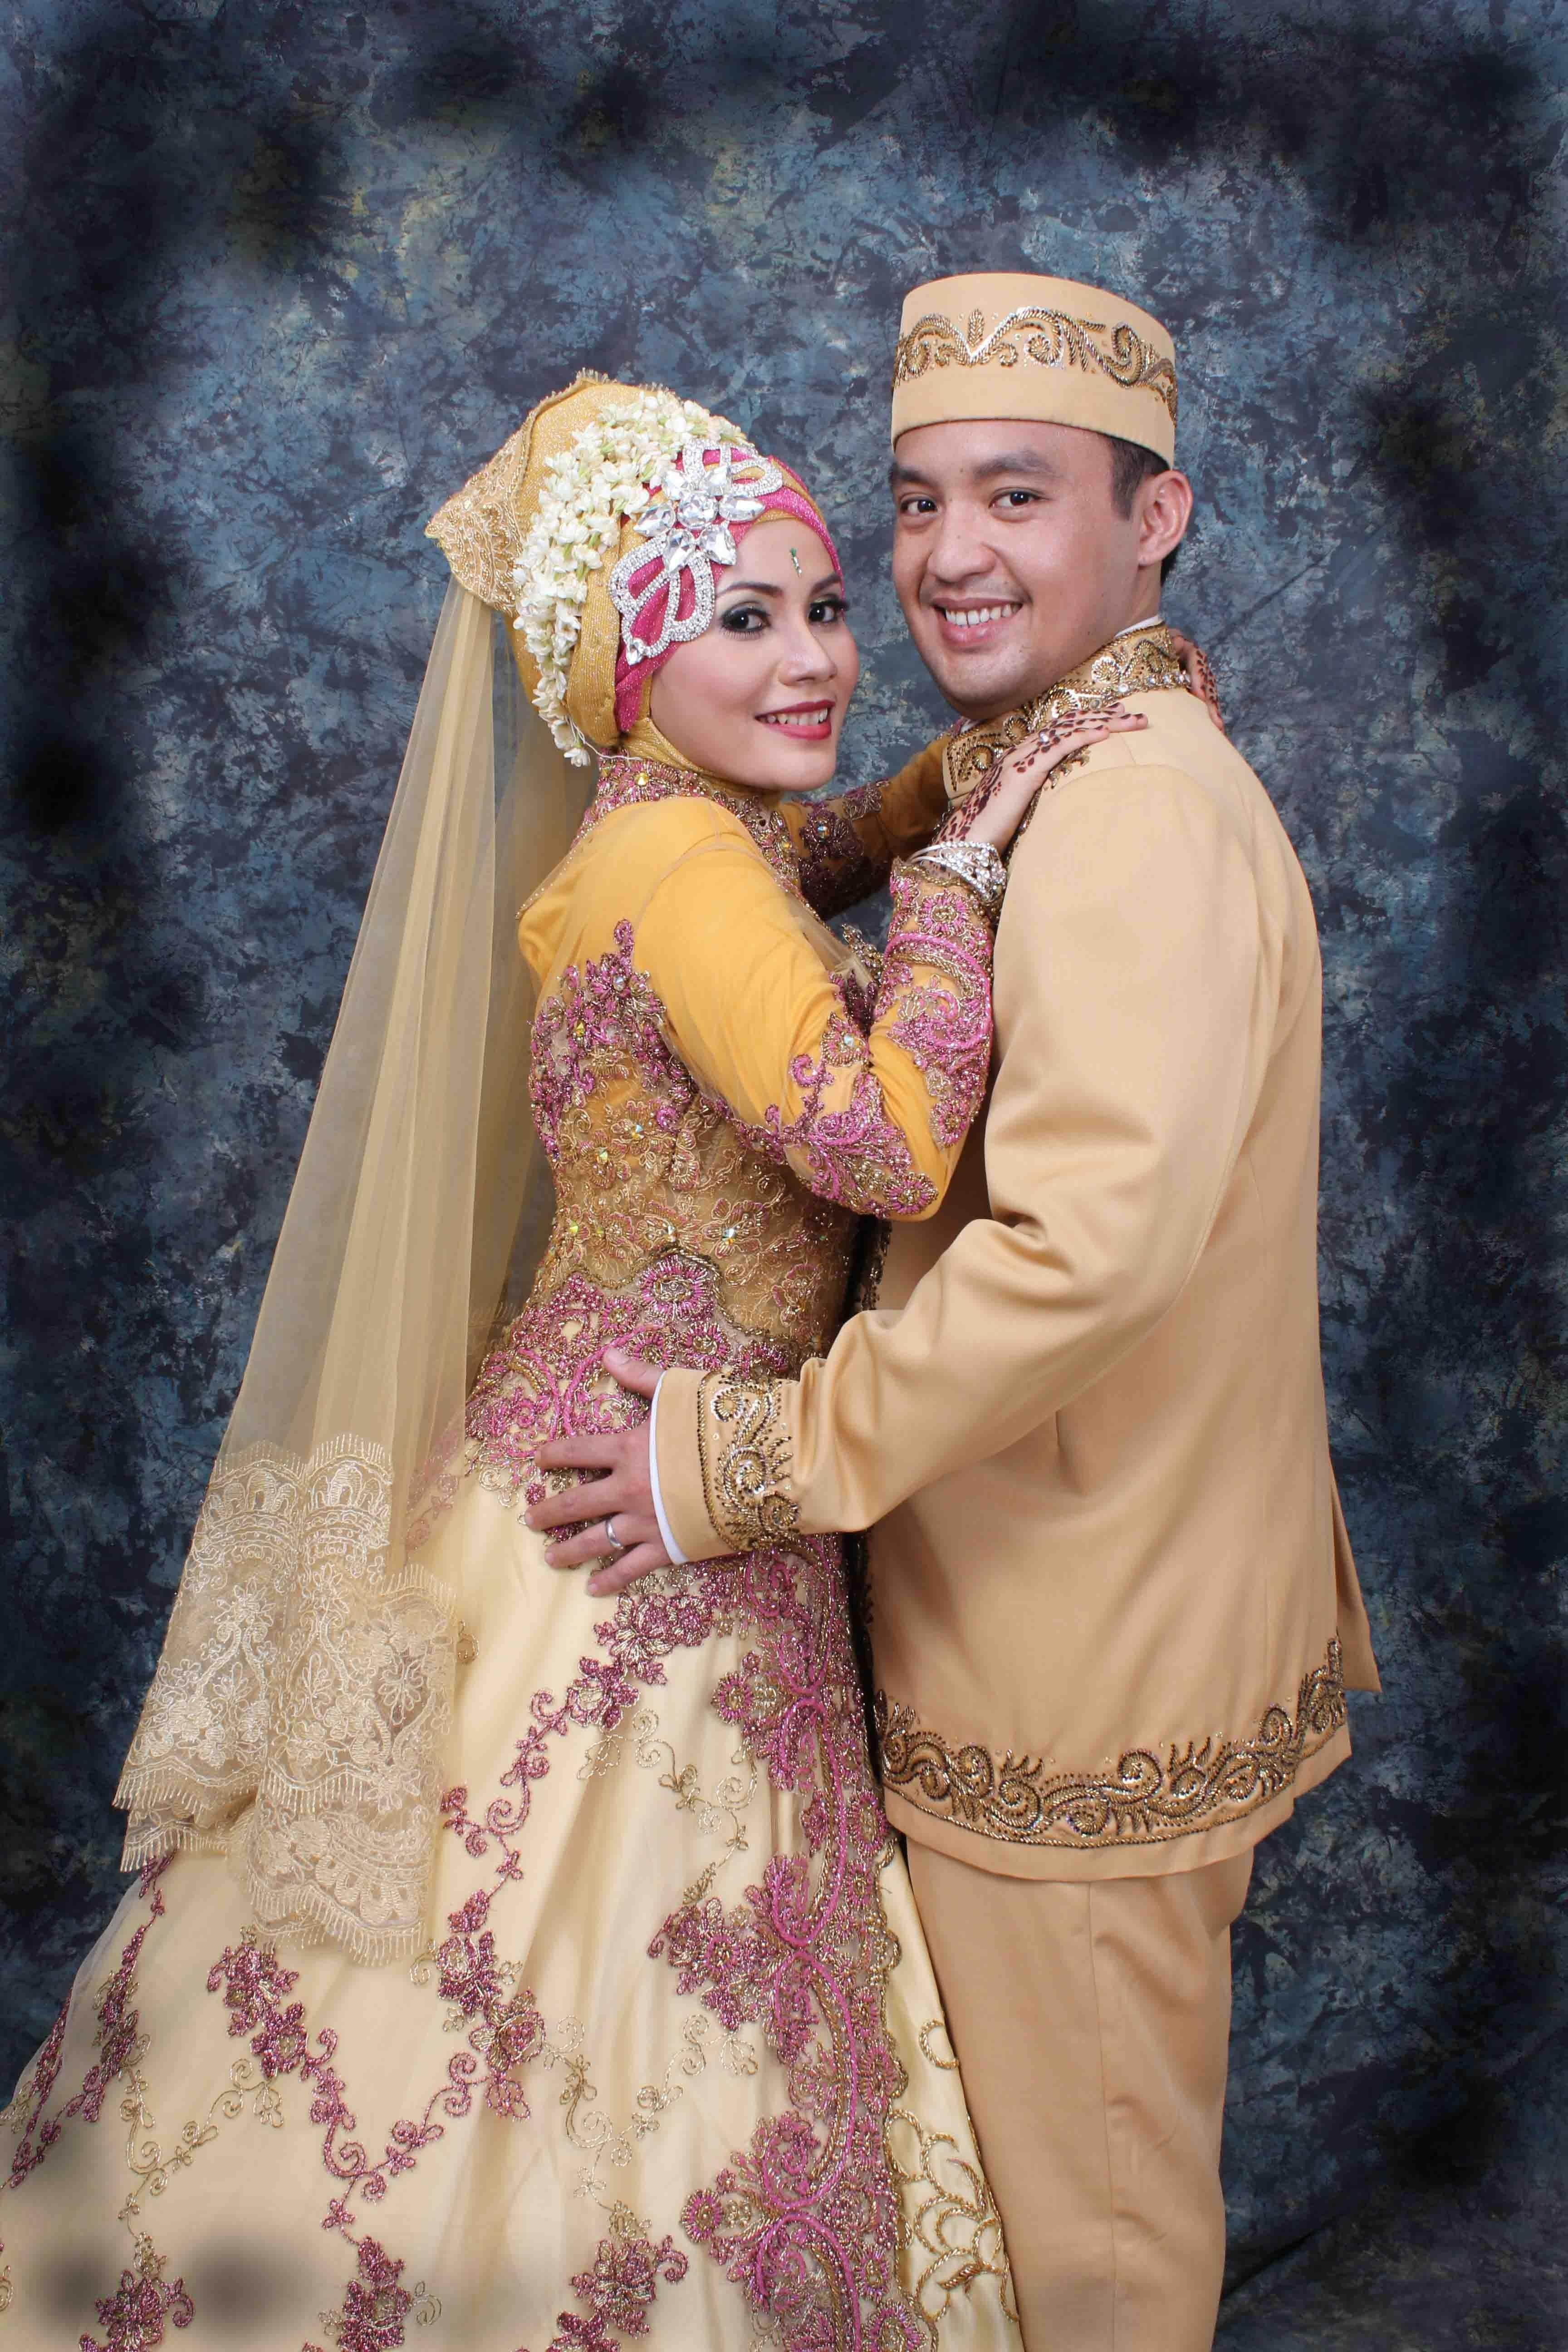 Model Gaun Pengantin Muslim Modifikasi 3id6 Amin Durian Amindurian On Pinterest